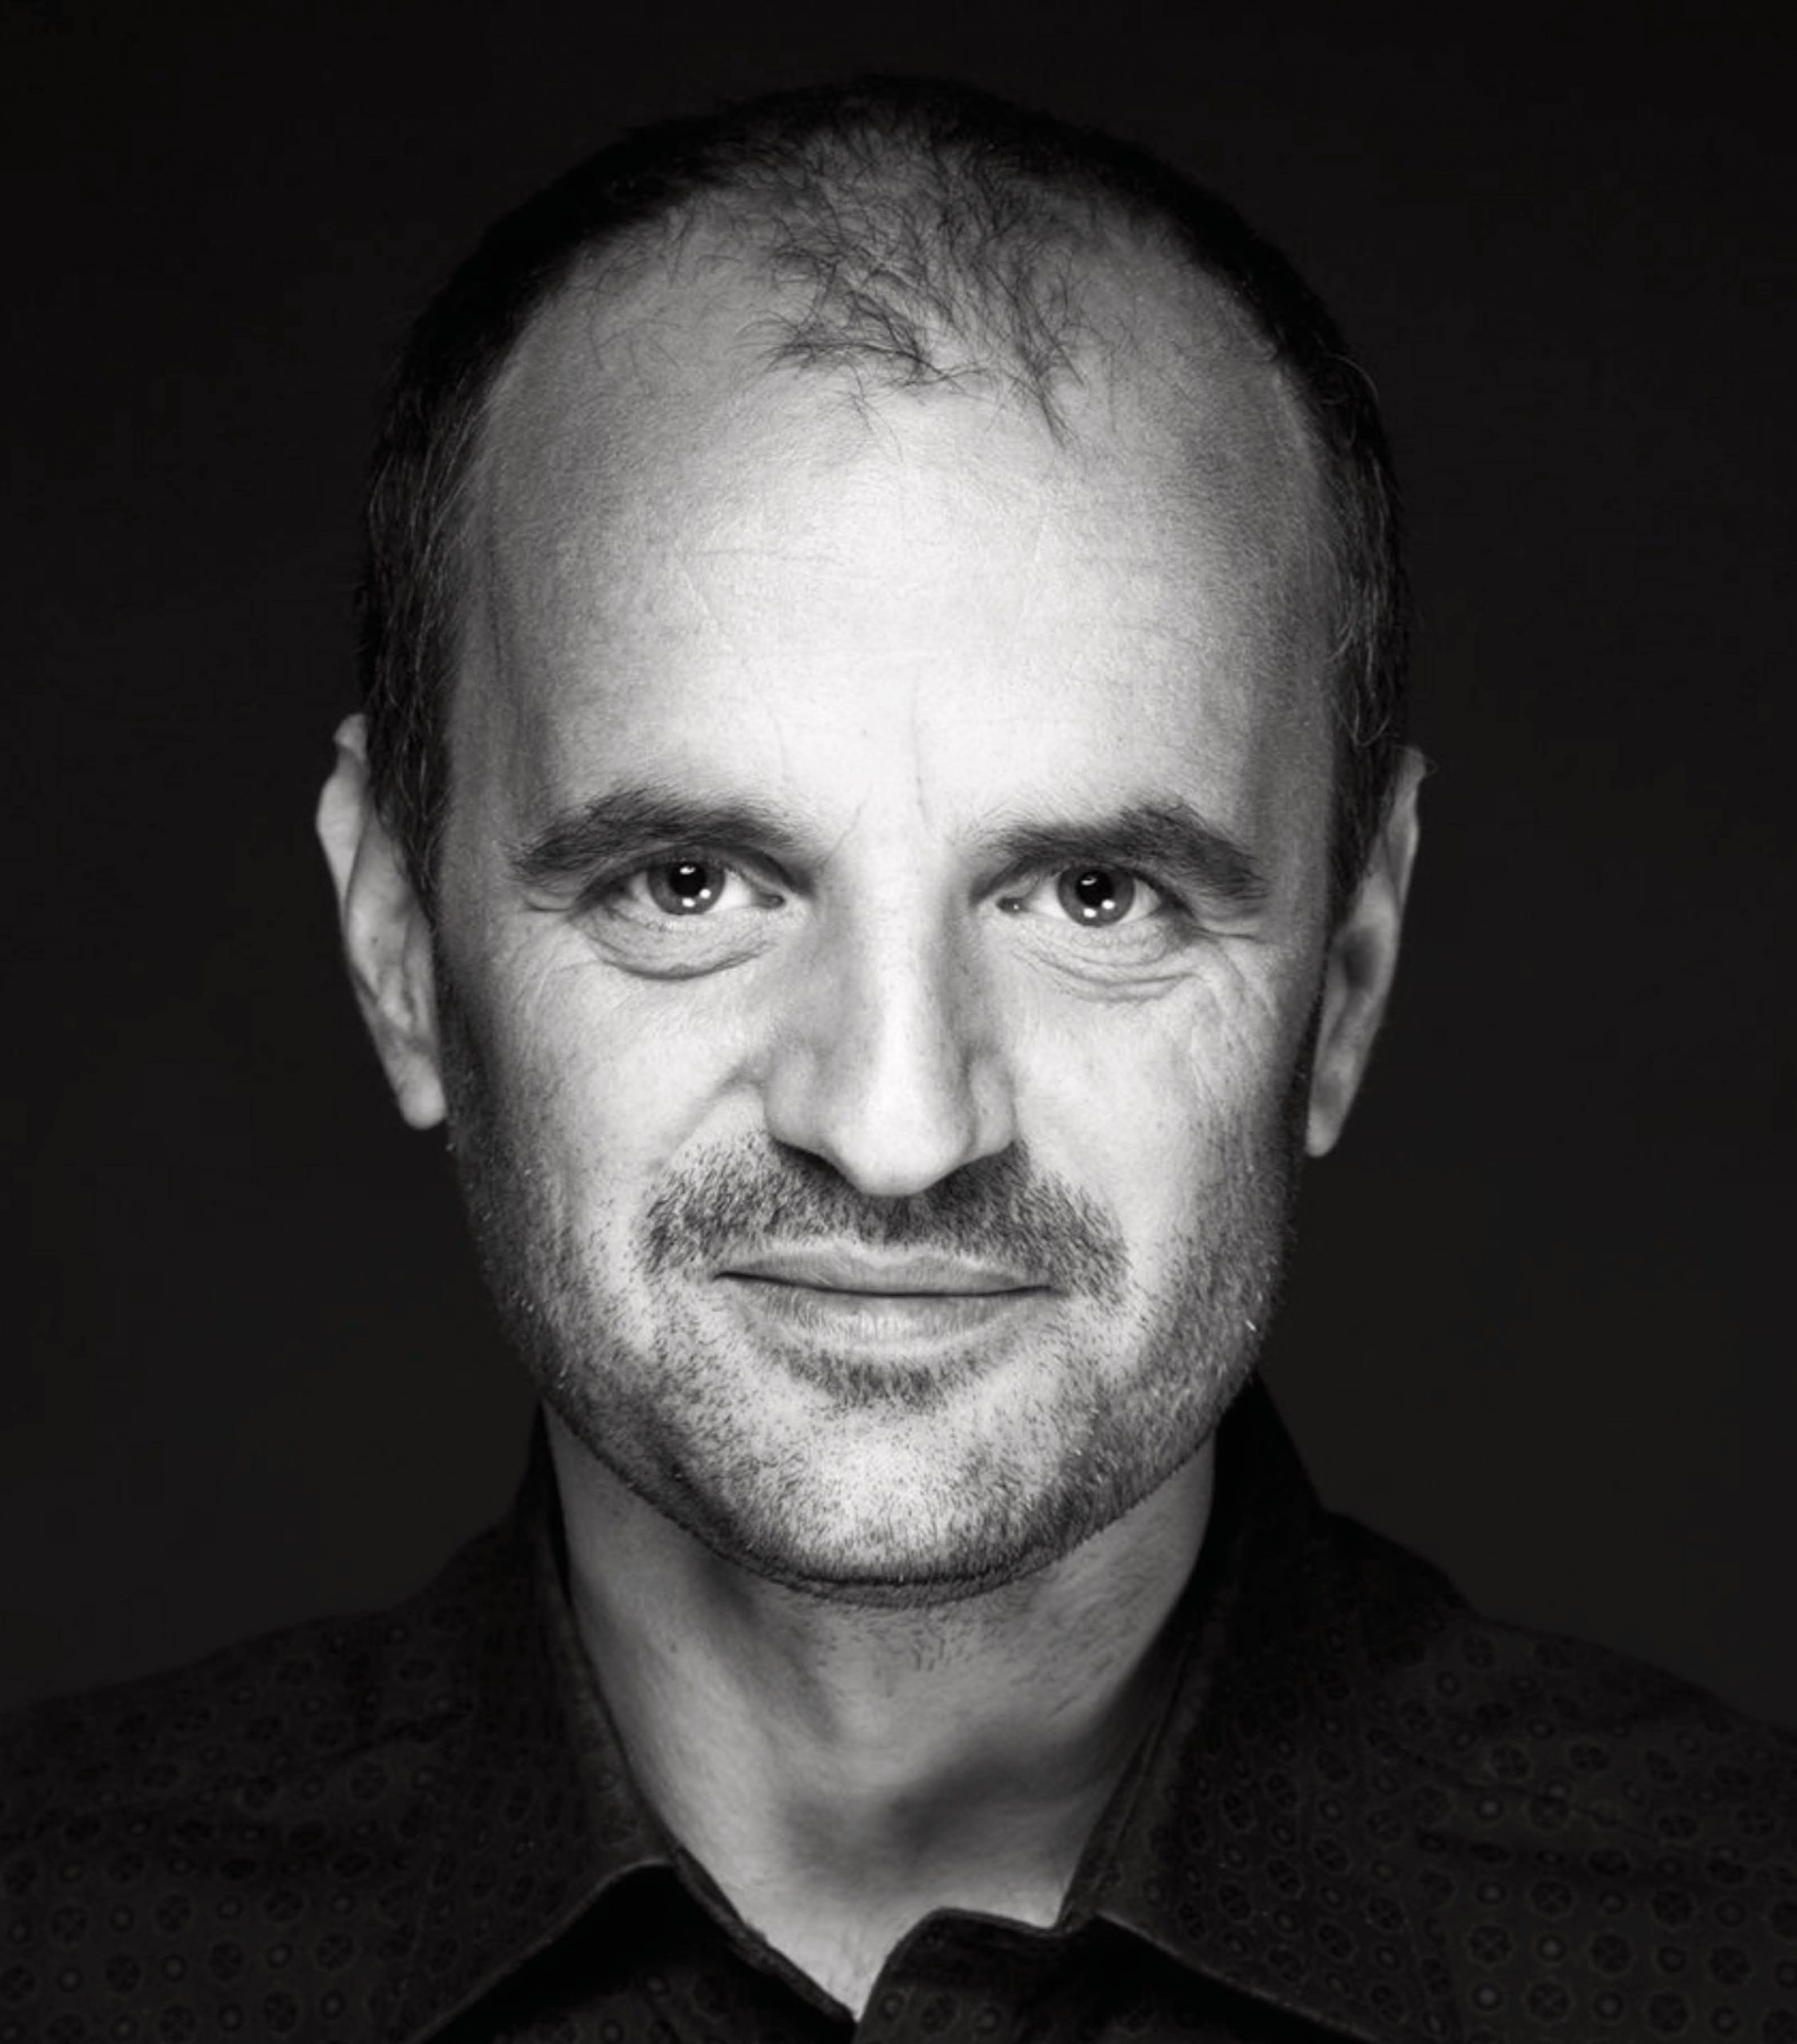 Black and white portrait of actor new thriller Exhibit #8